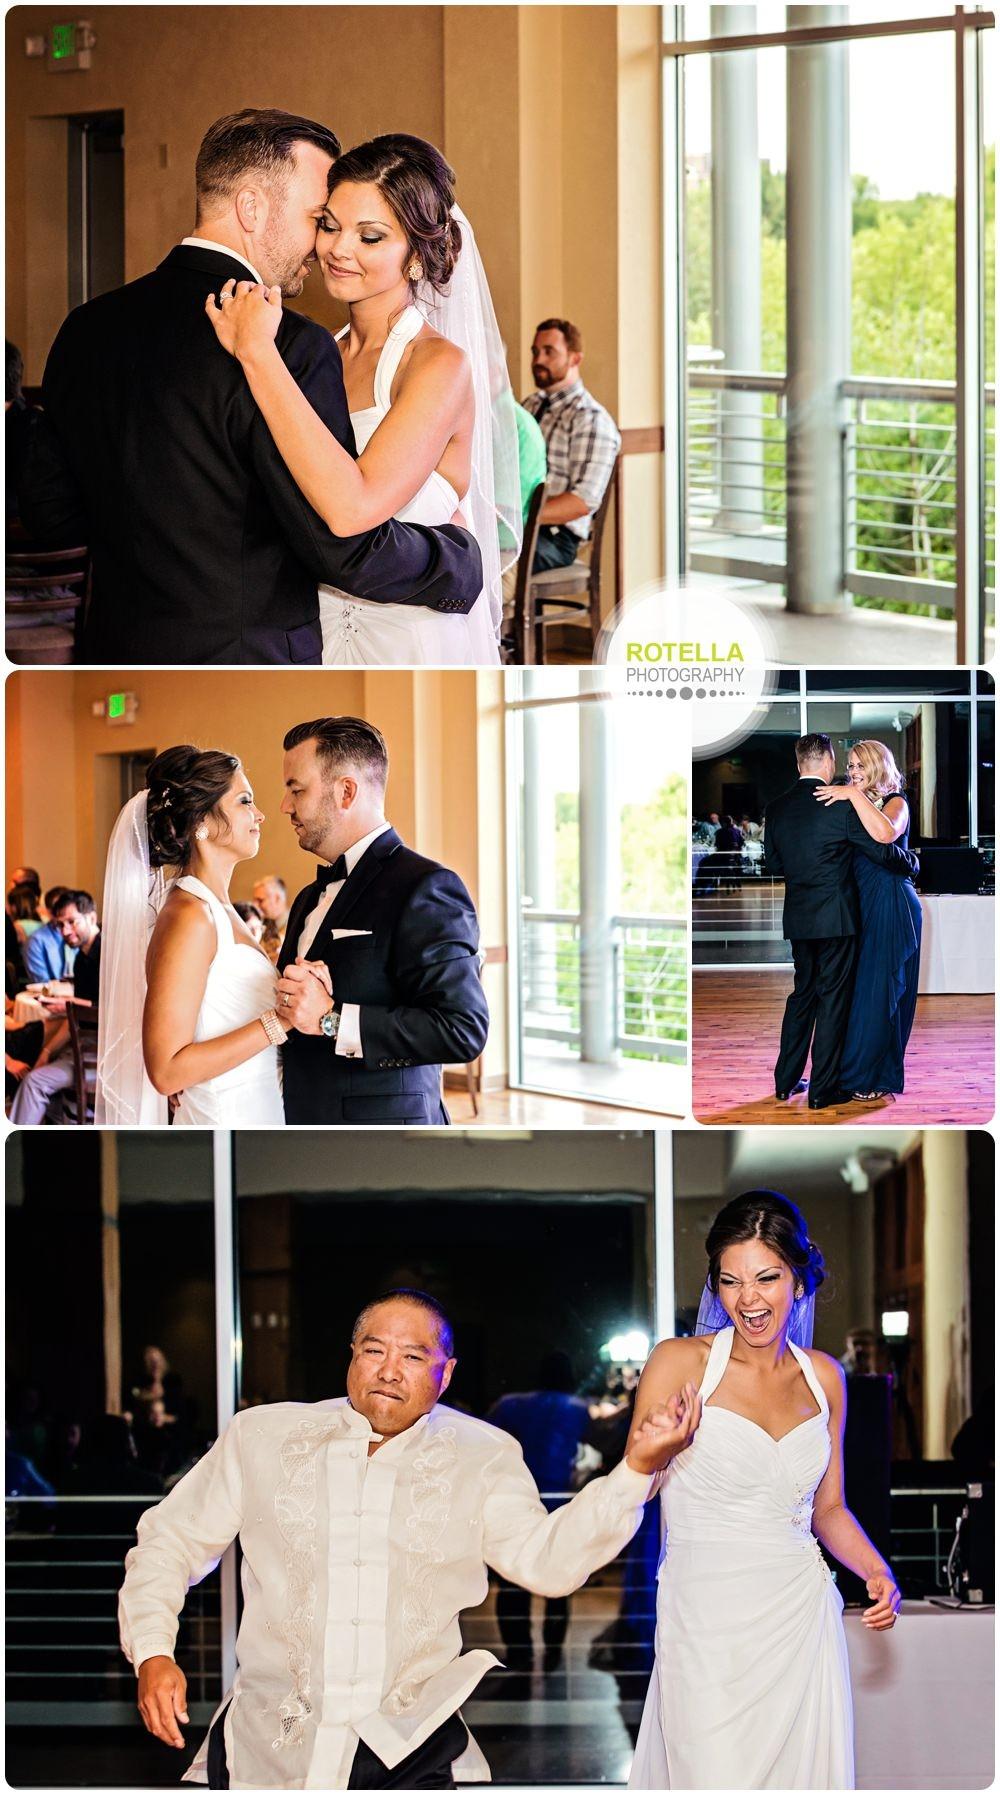 MELANIE-DEREK-MINNESOTA-WEDDING-PHOTOGRAPHY-ROTELLA-PHOTOGRAPHY_2015-15